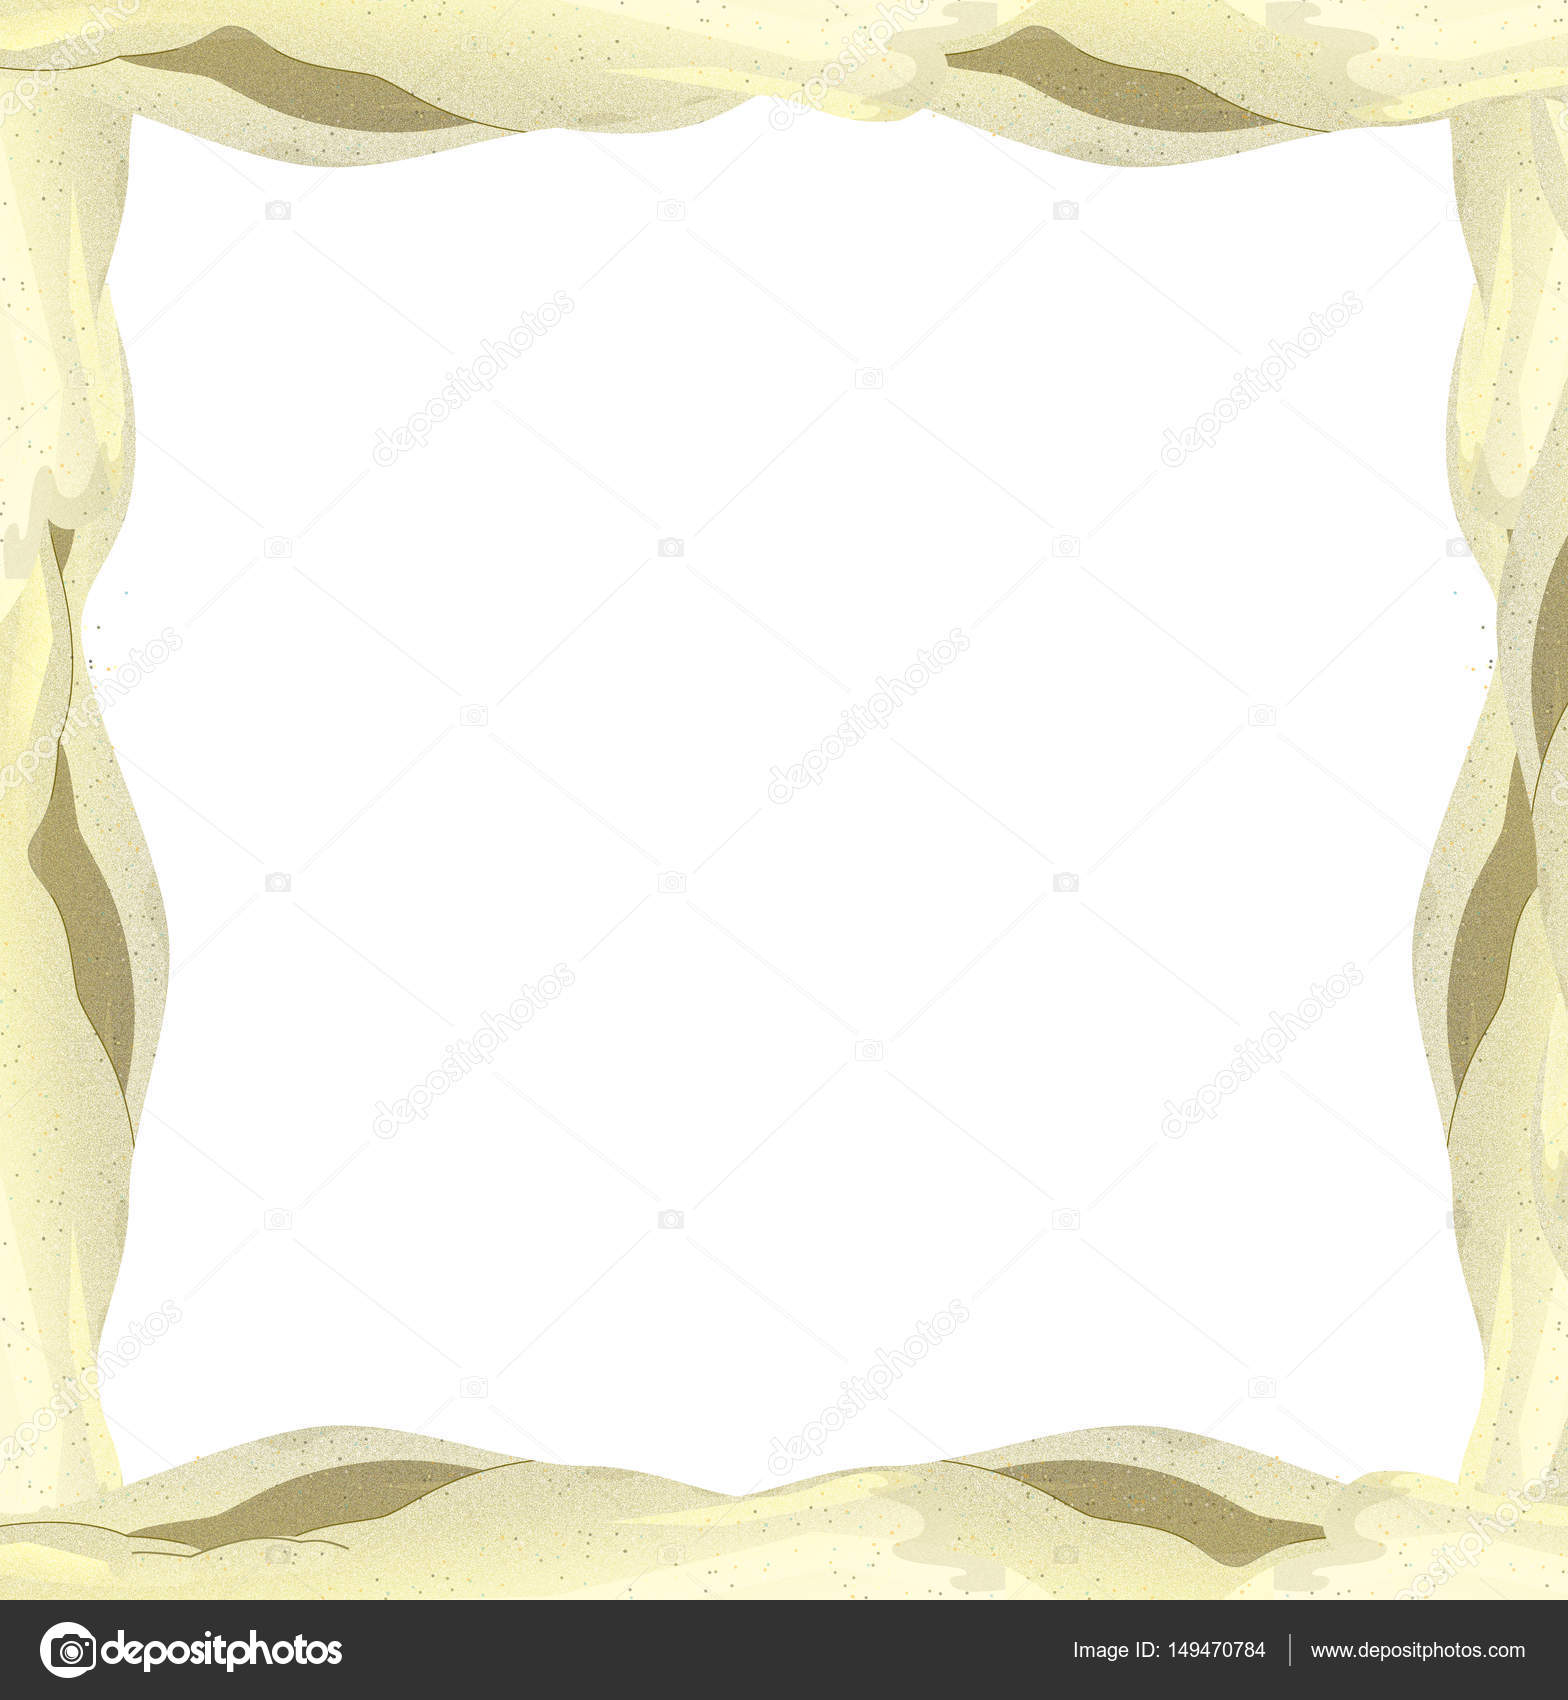 Cartoon sand frame — Stock Photo © illustrator_hft #149470784